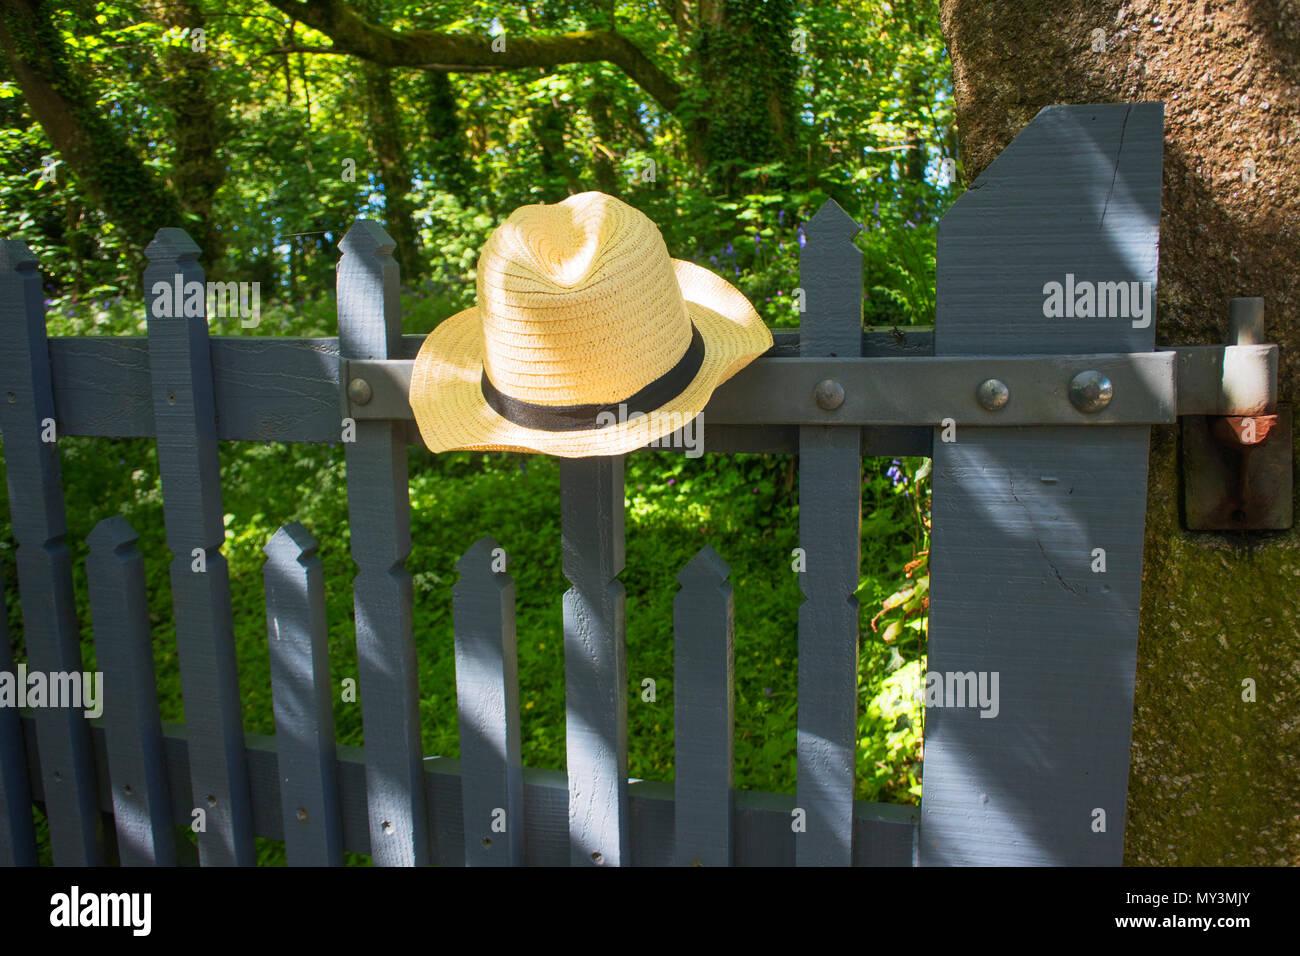 A mans straw hat left on a garden gate - John Gollop - Stock Image